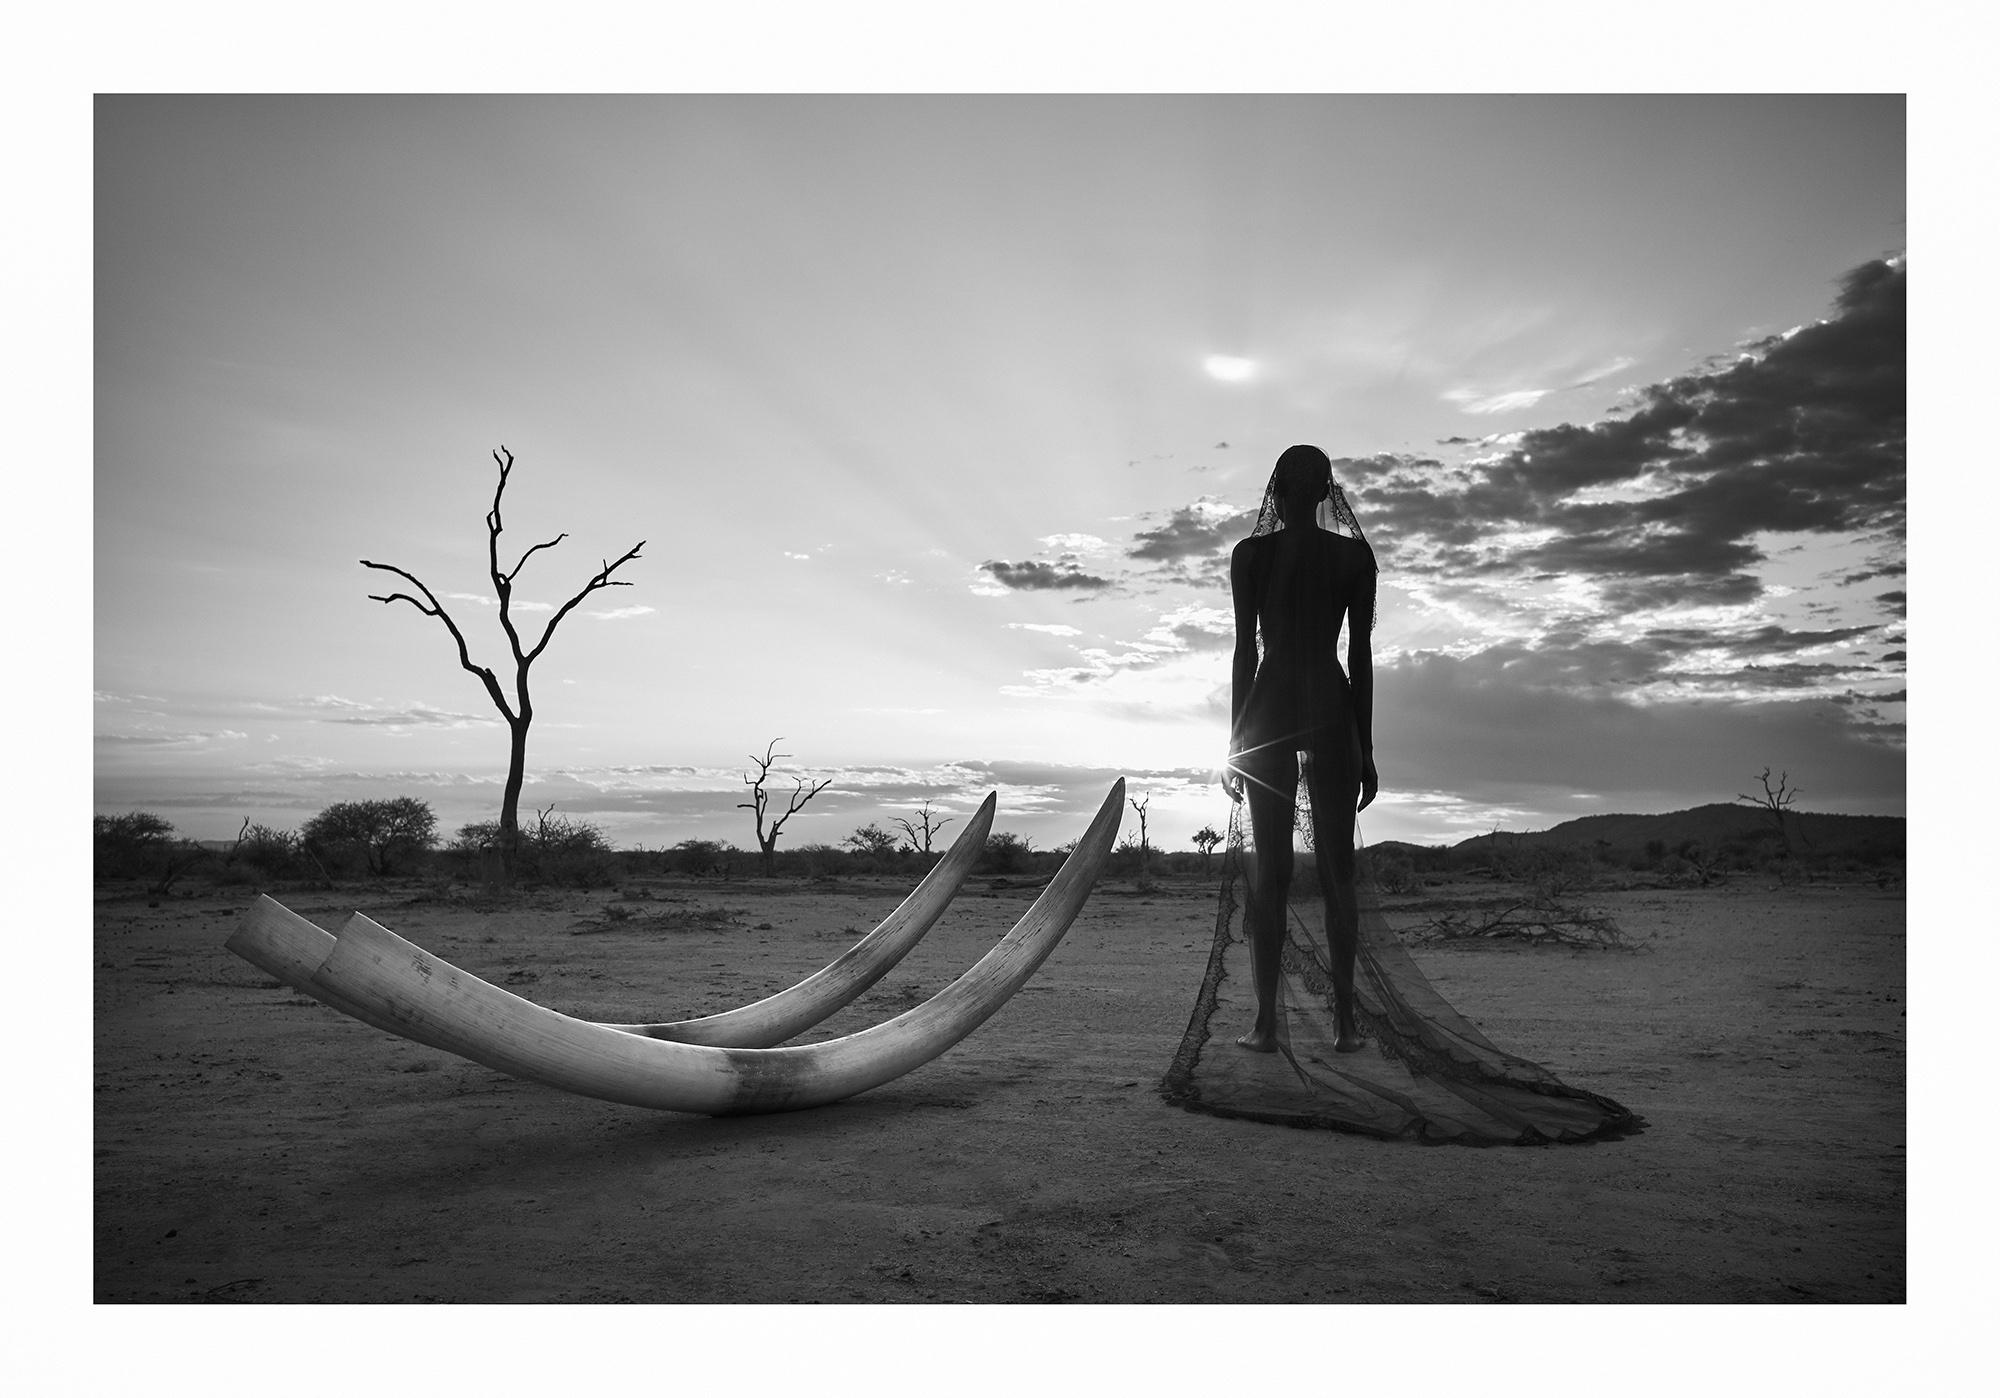 12 Natural Wonders in Afrika von Paul Giggle 6